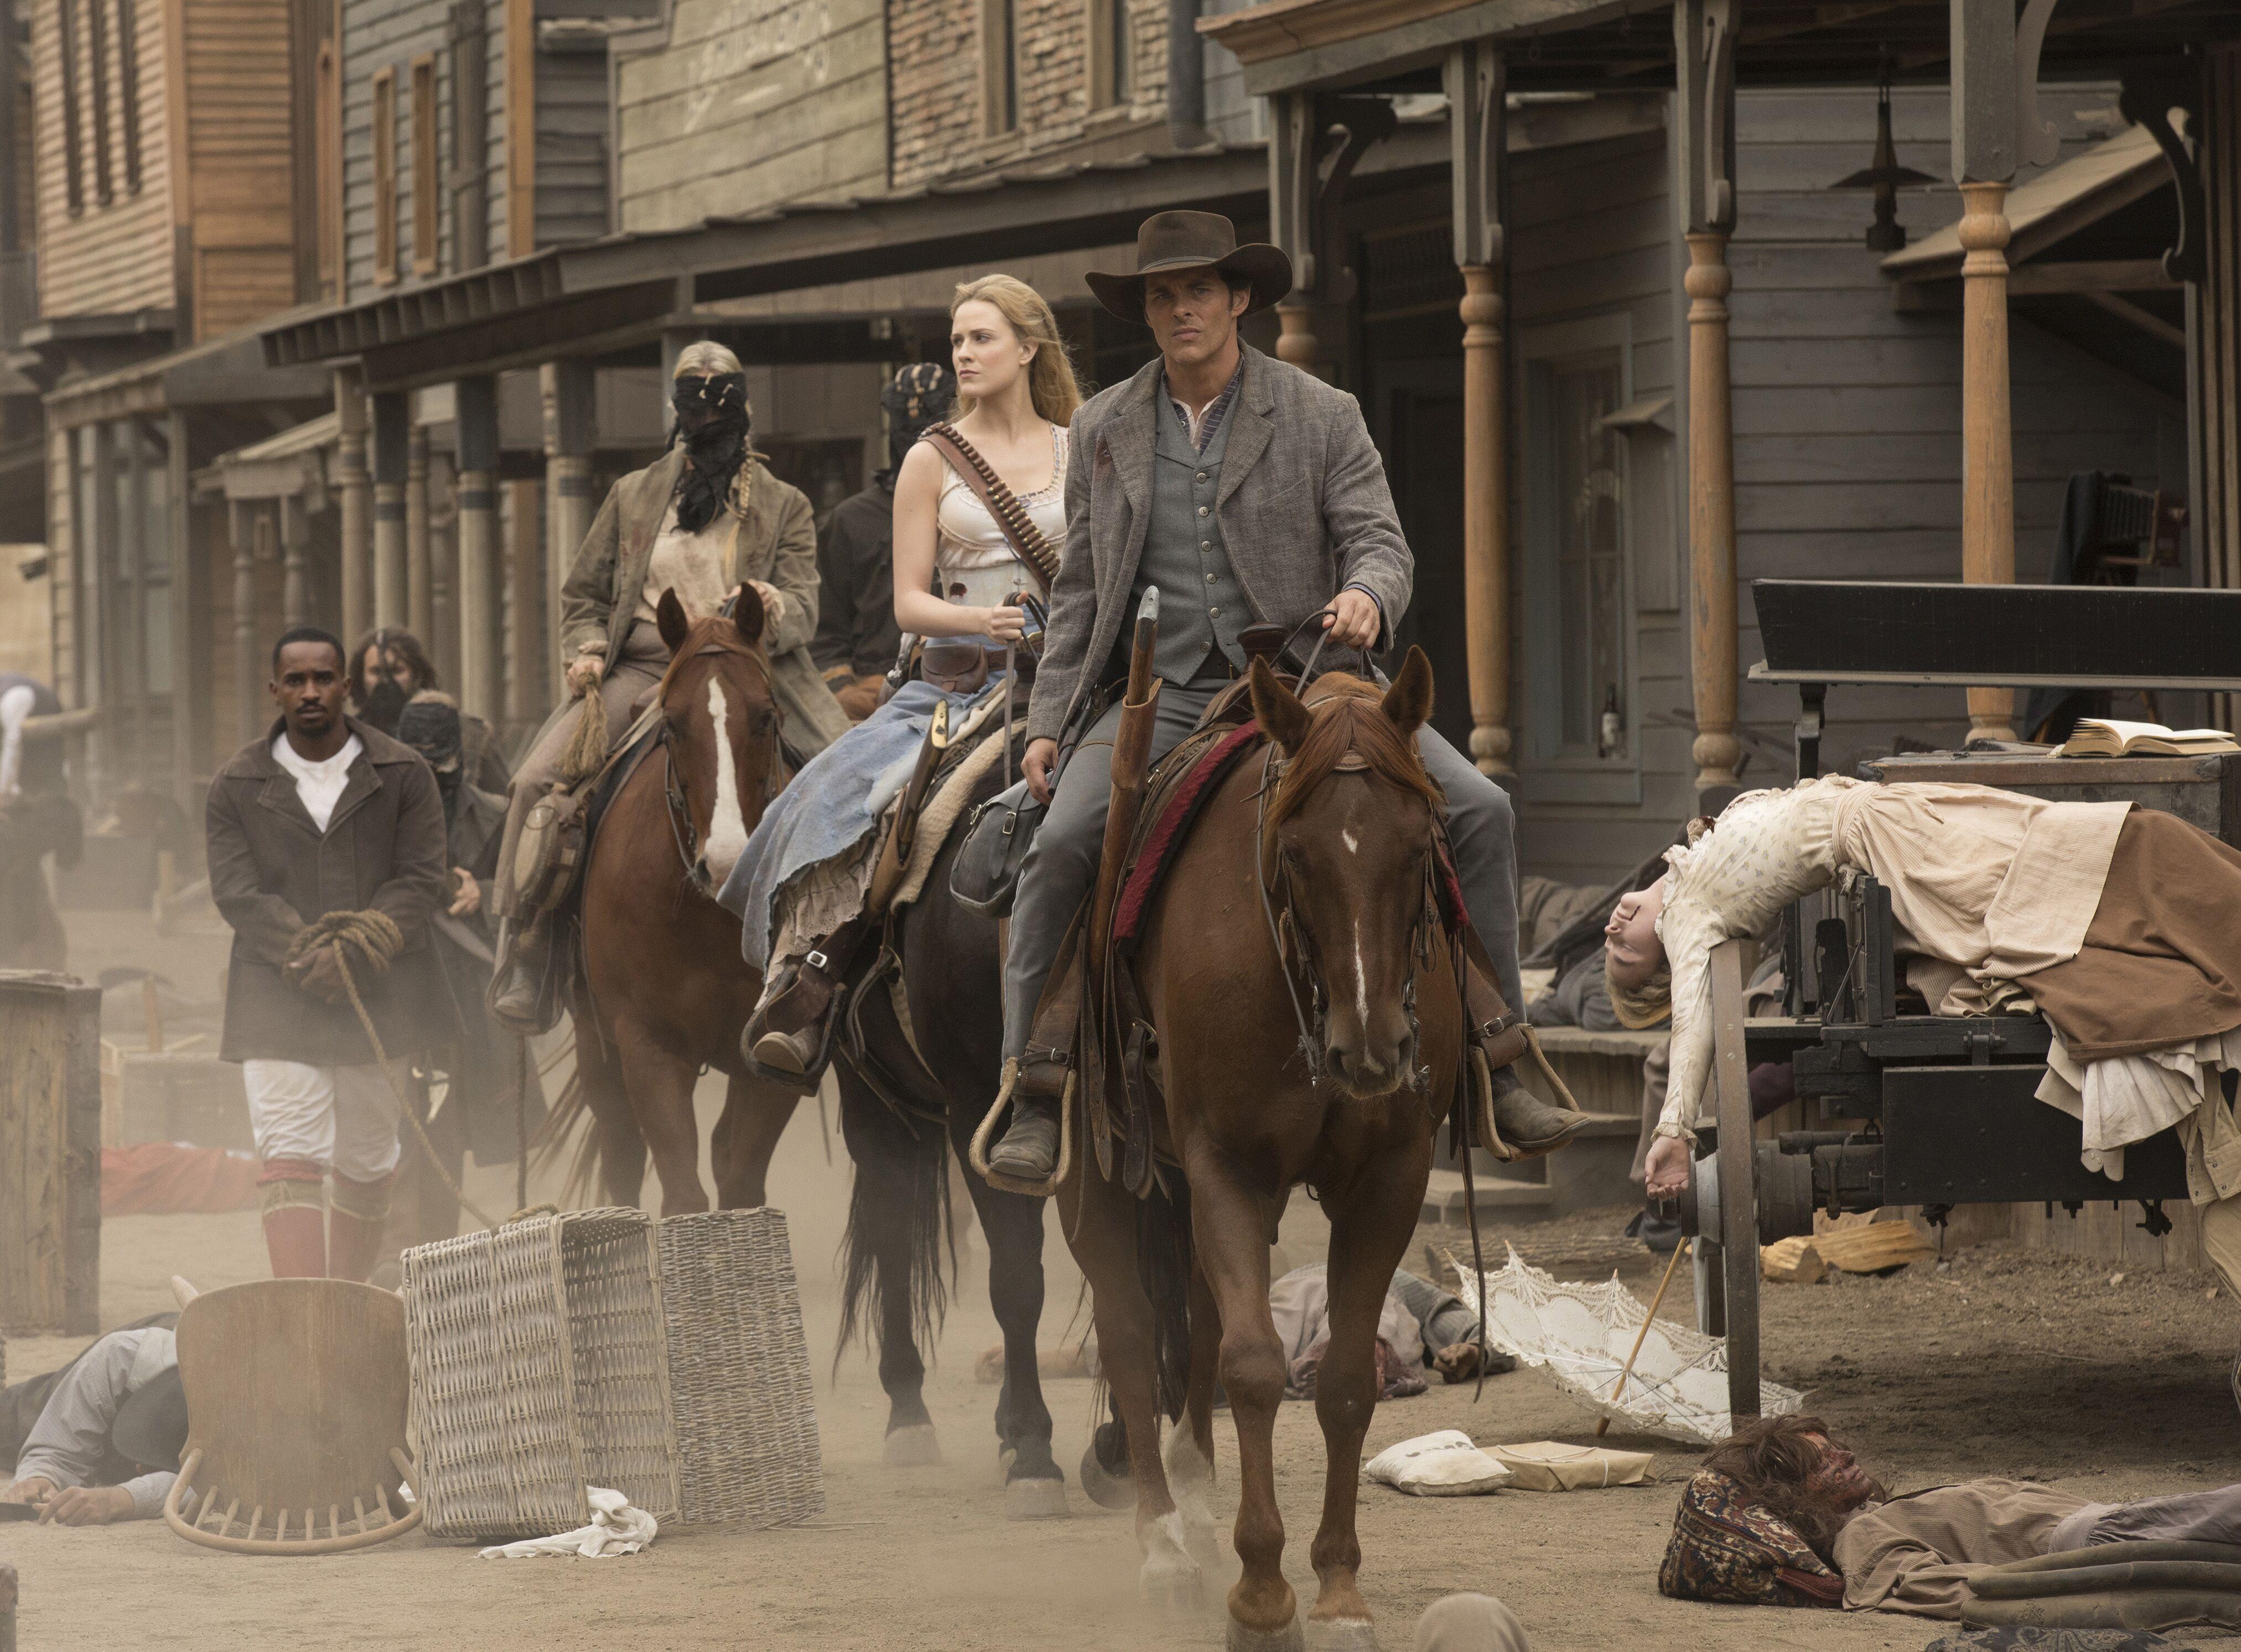 Editorial: Do long breaks hurt shows like HBO's Westworld?